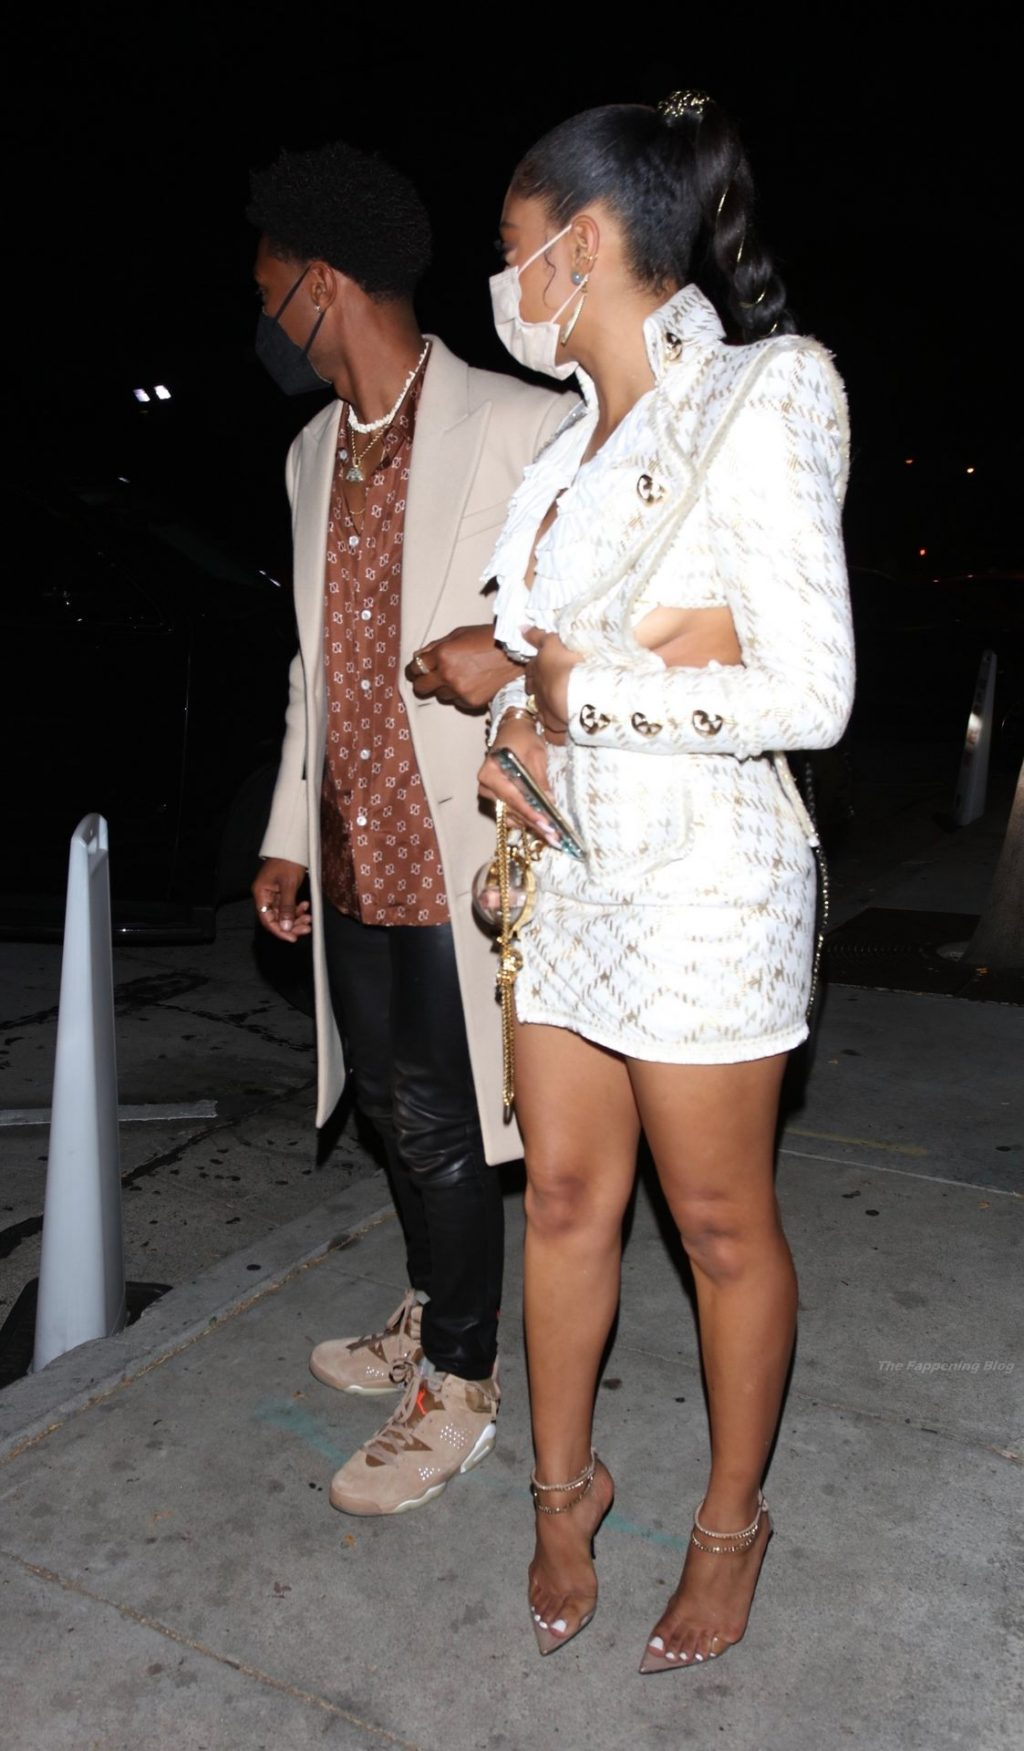 Sierra Capri & Jonathan Daviss Are Seen Leaving Craig's After a Night of Celebrating (15 Photos)